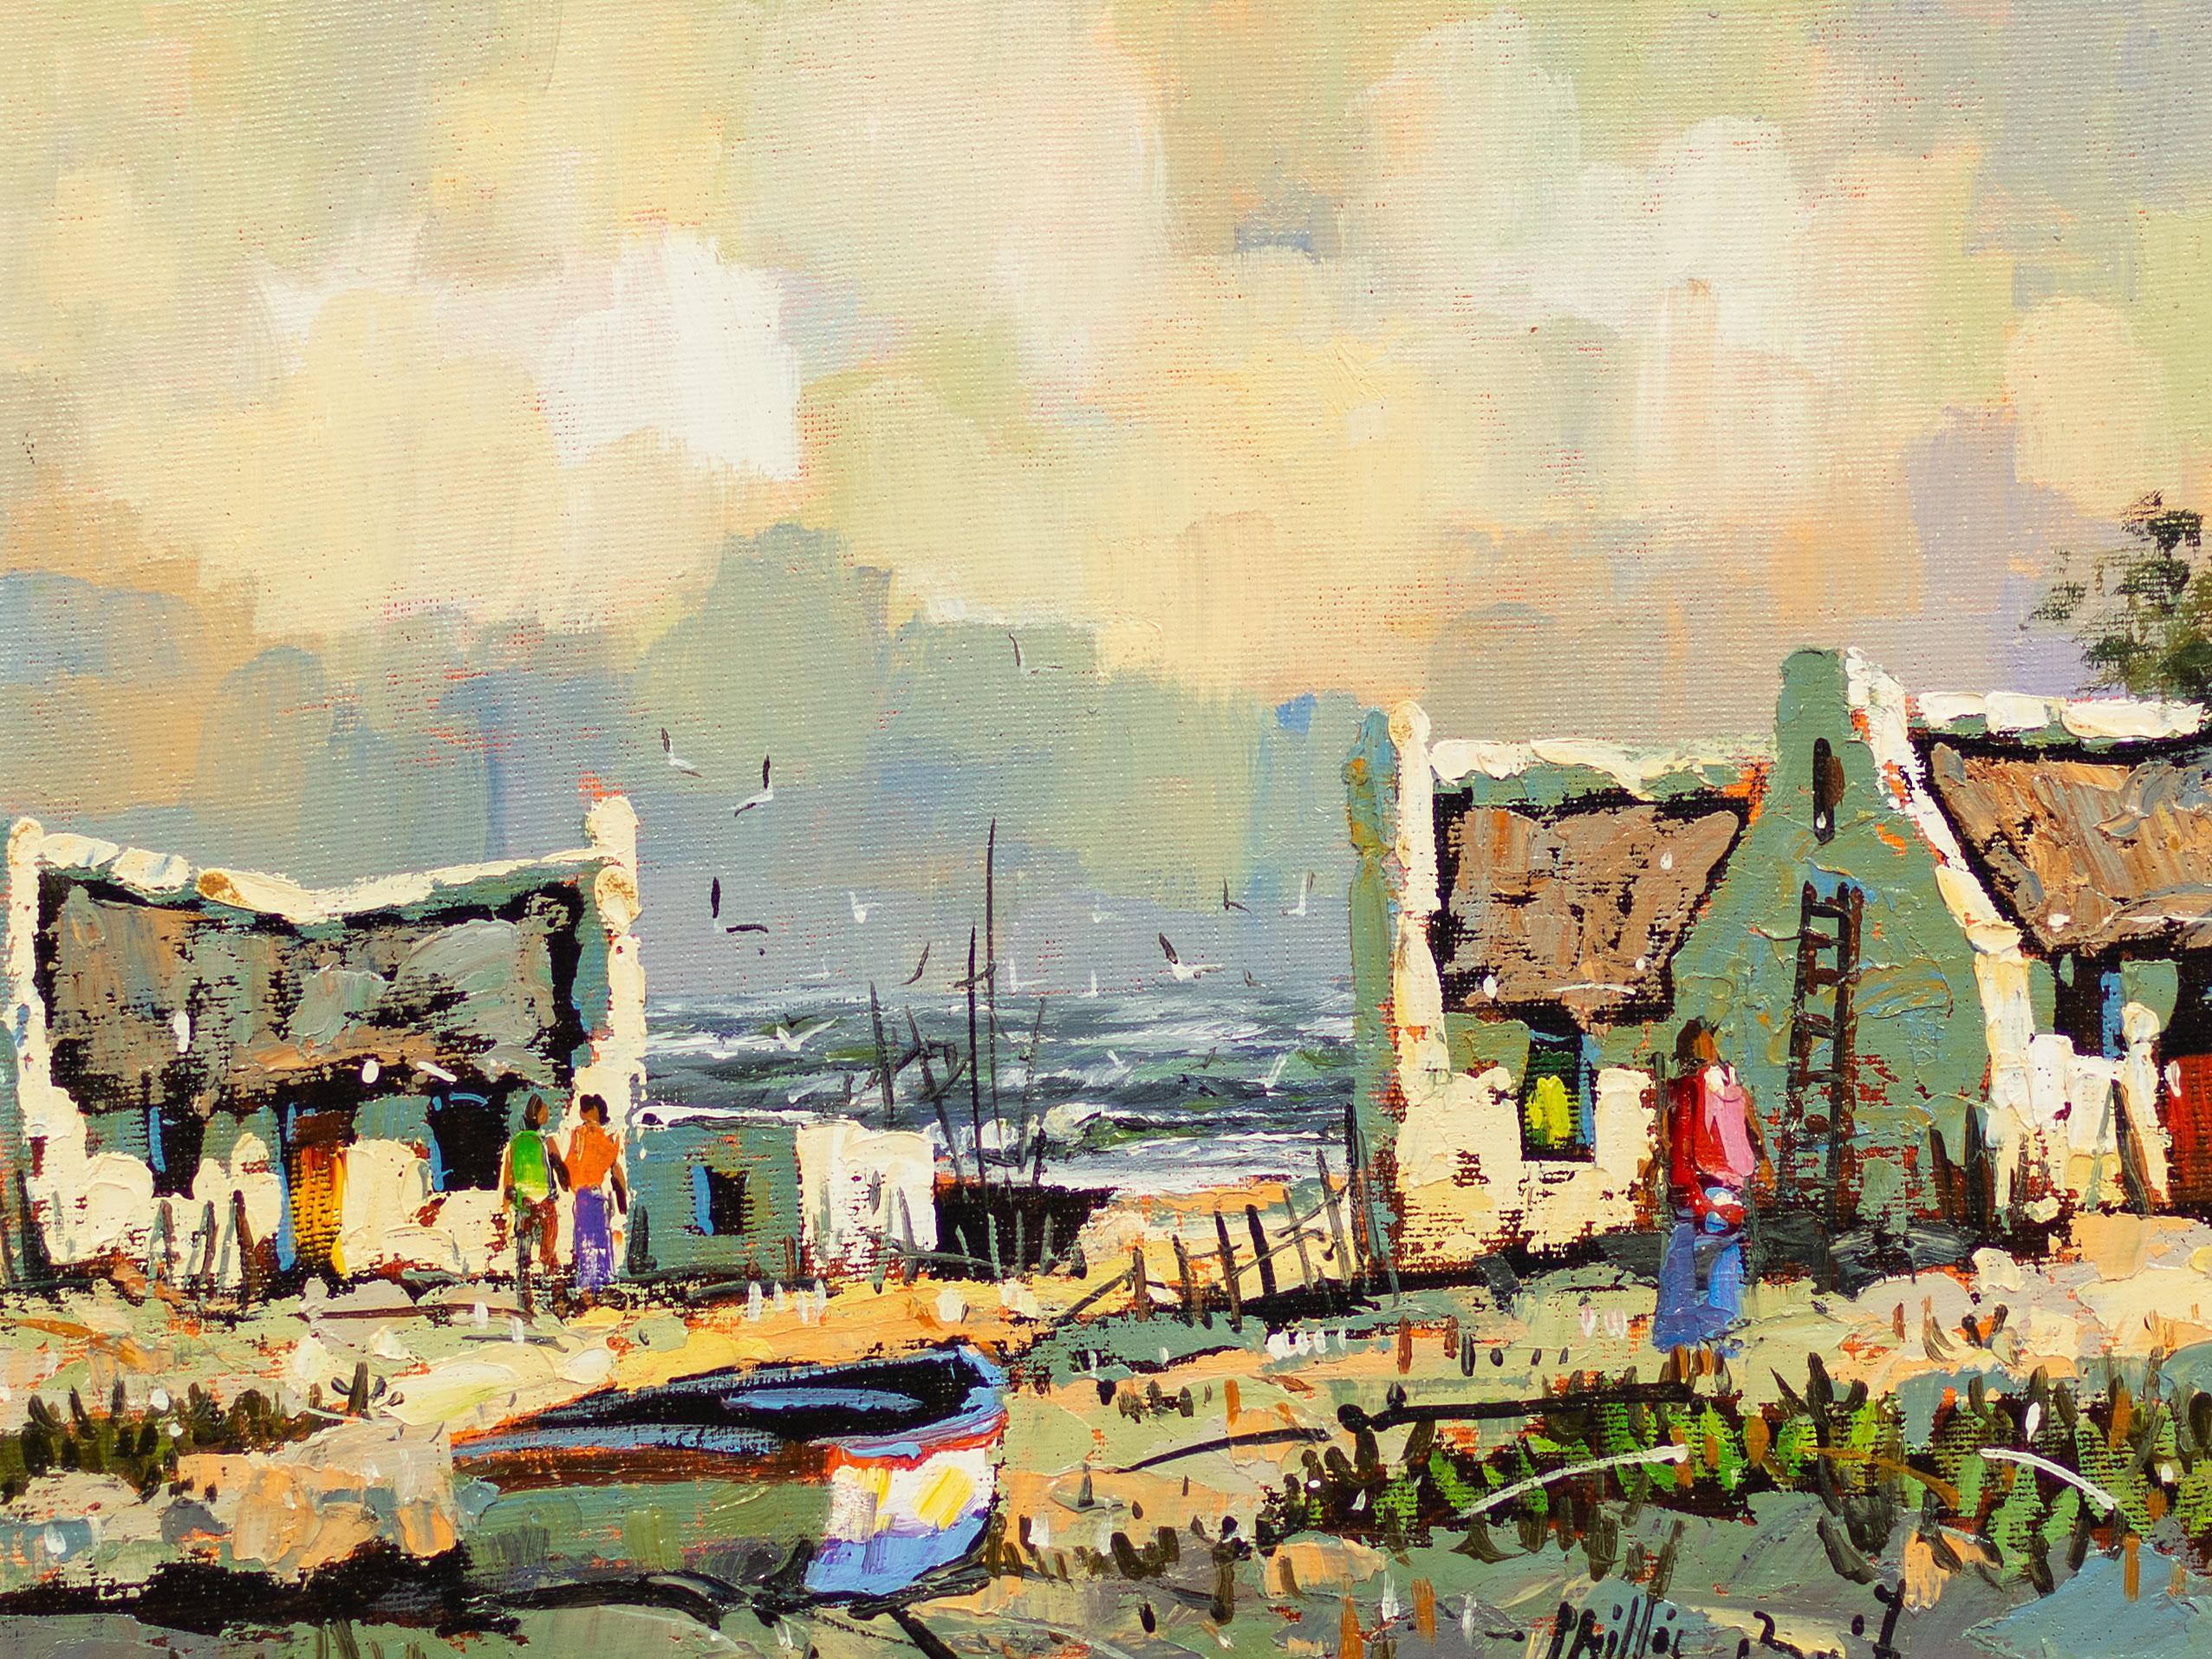 Phillip Britz (SA, born 1966) Oil, Arniston Cottages, Signed, 24 x 34